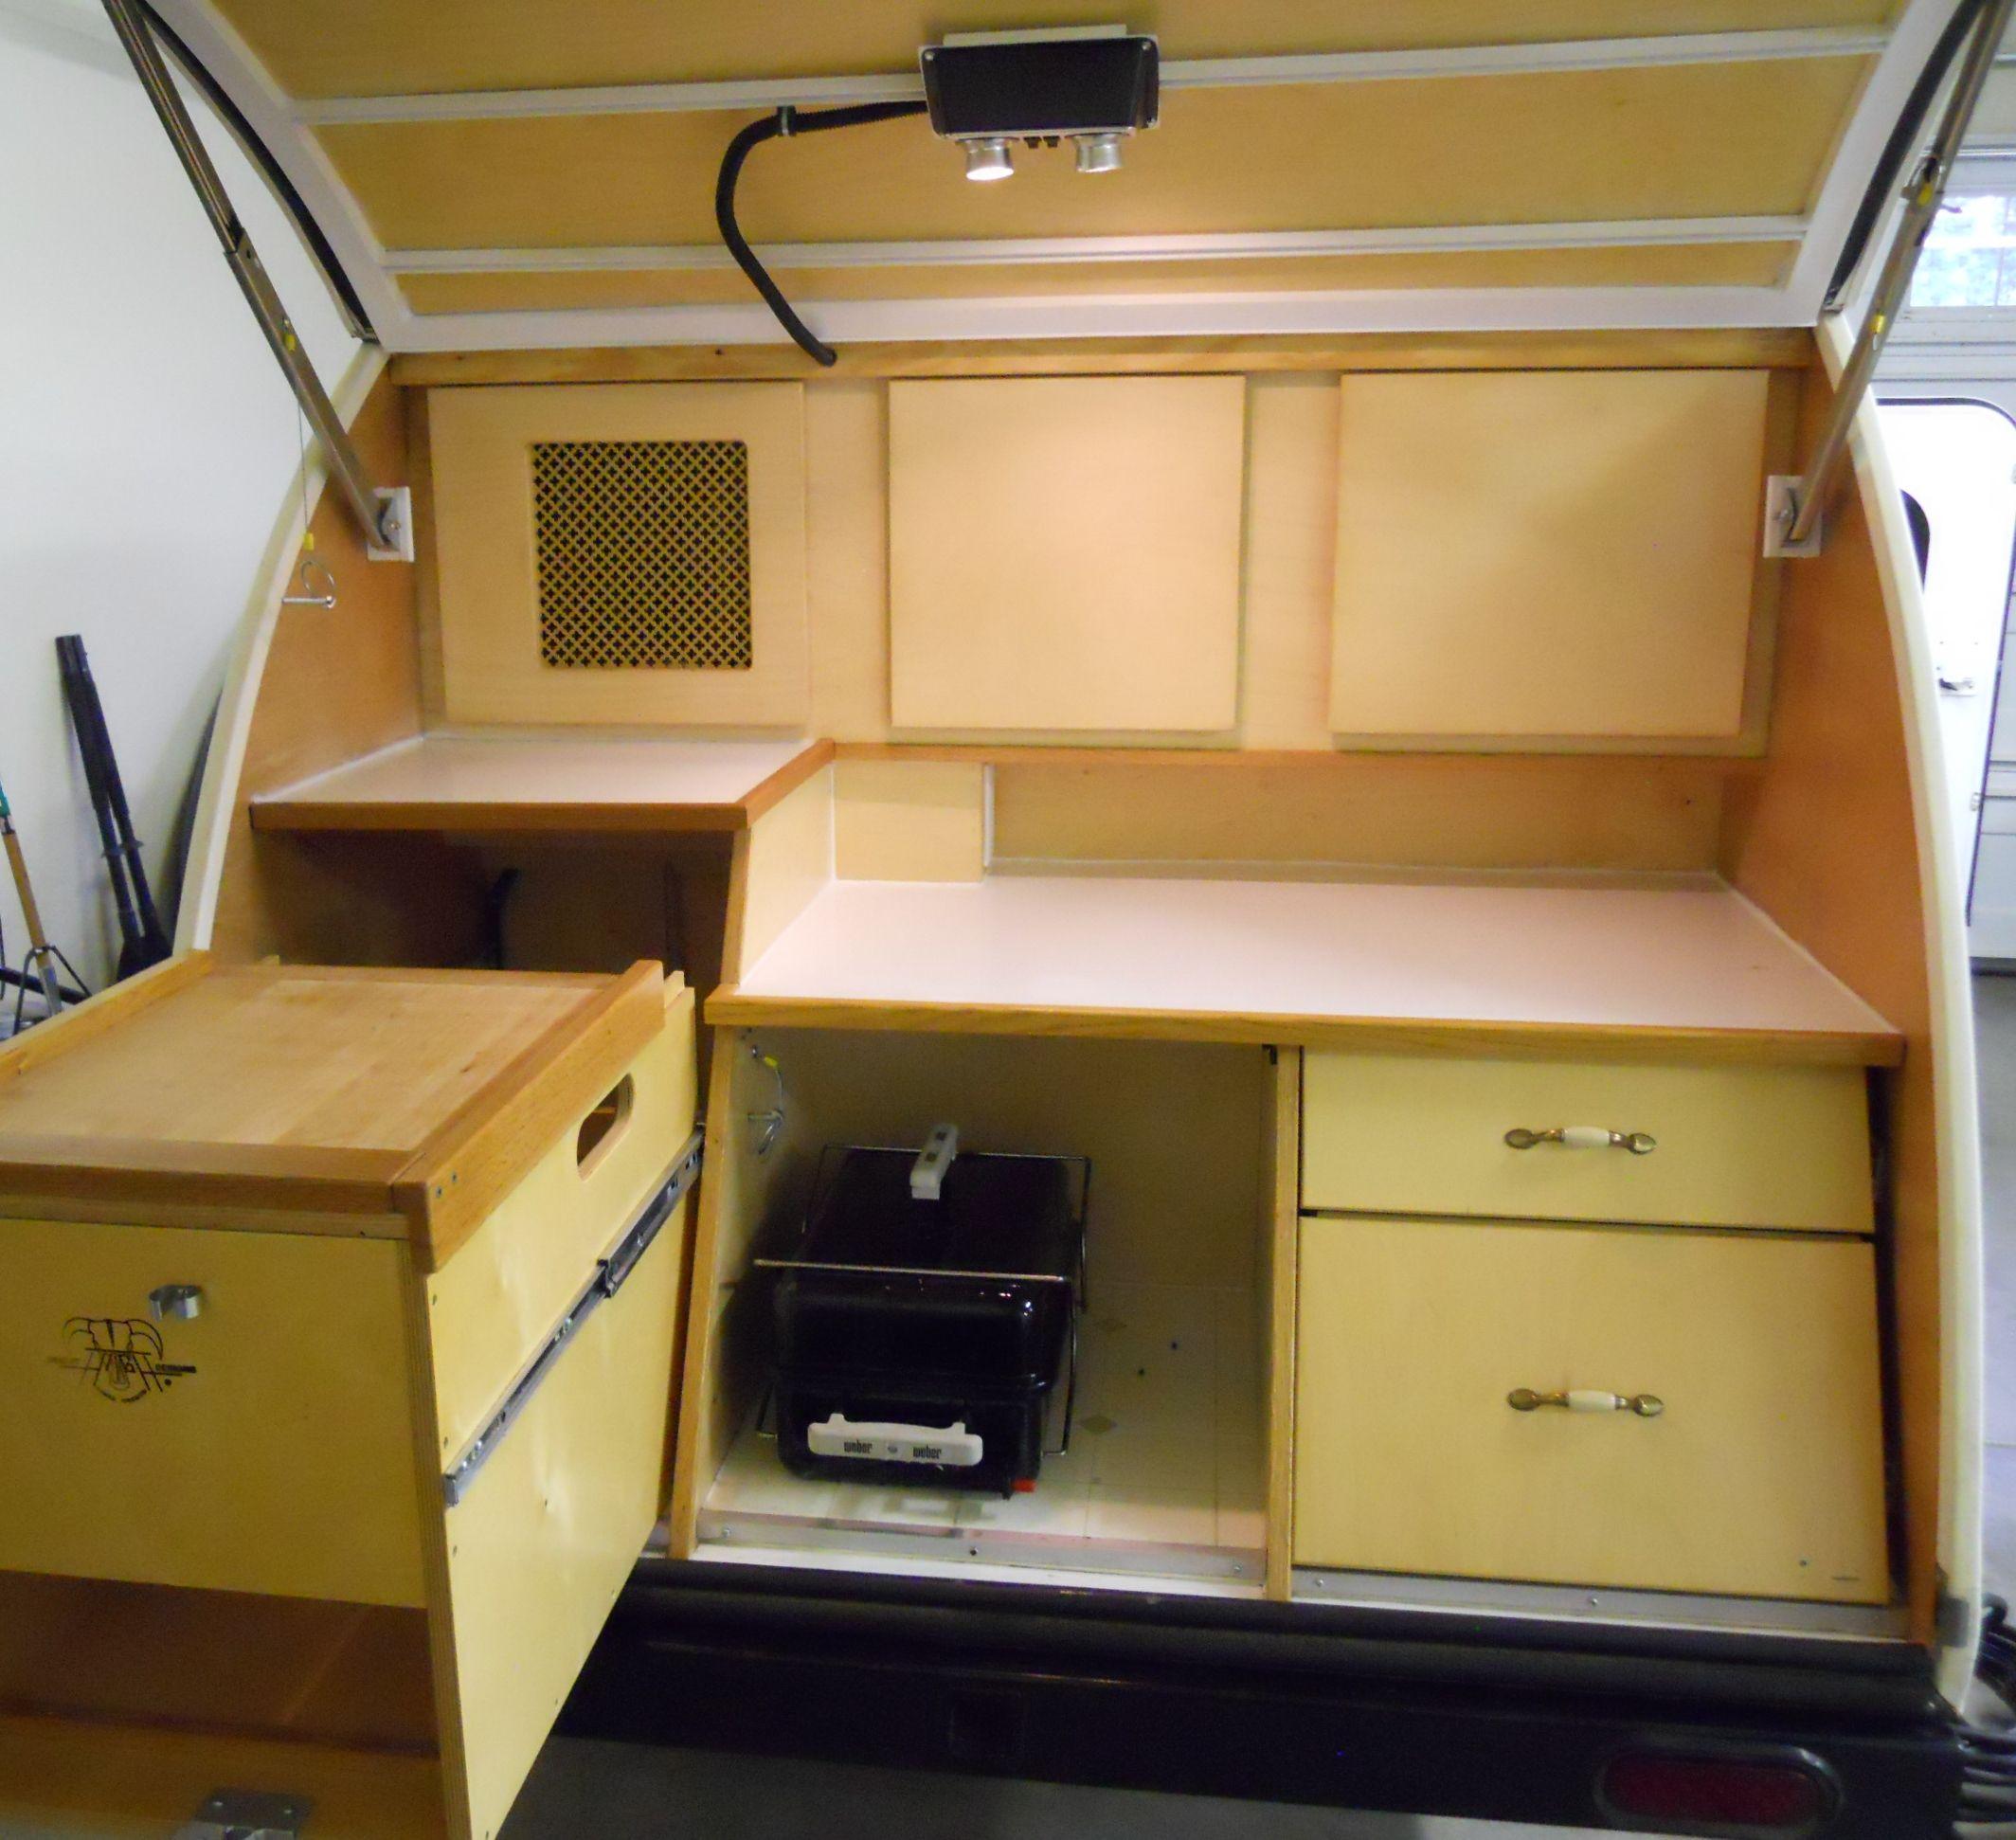 Galley kitchen teardrop camping pinterest for Teardrop camper kitchen ideas